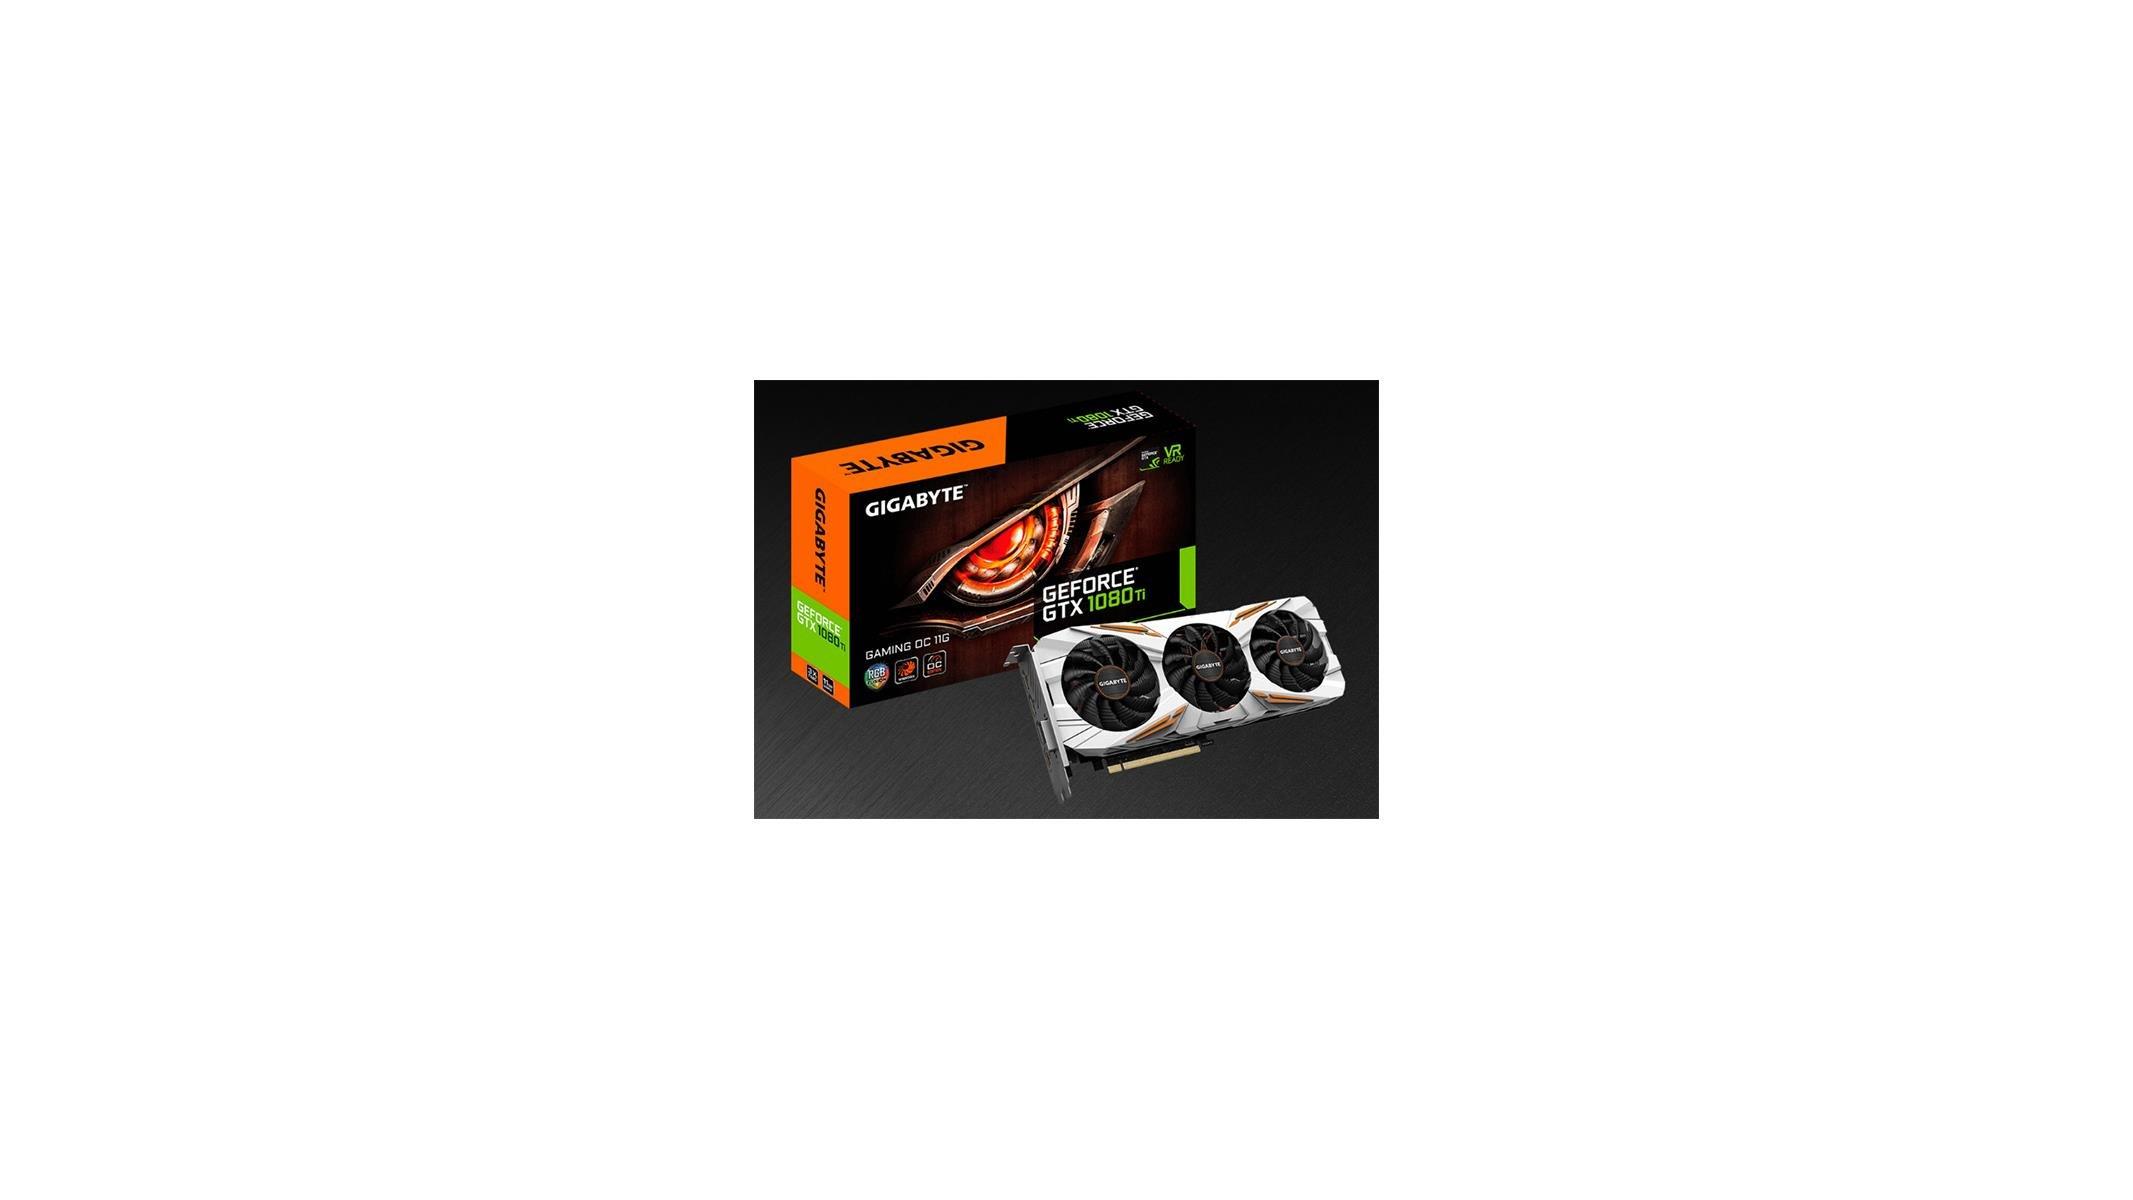 Gigabyte Seeks 4K Gaming Domination With Three Custom GeForce GTX